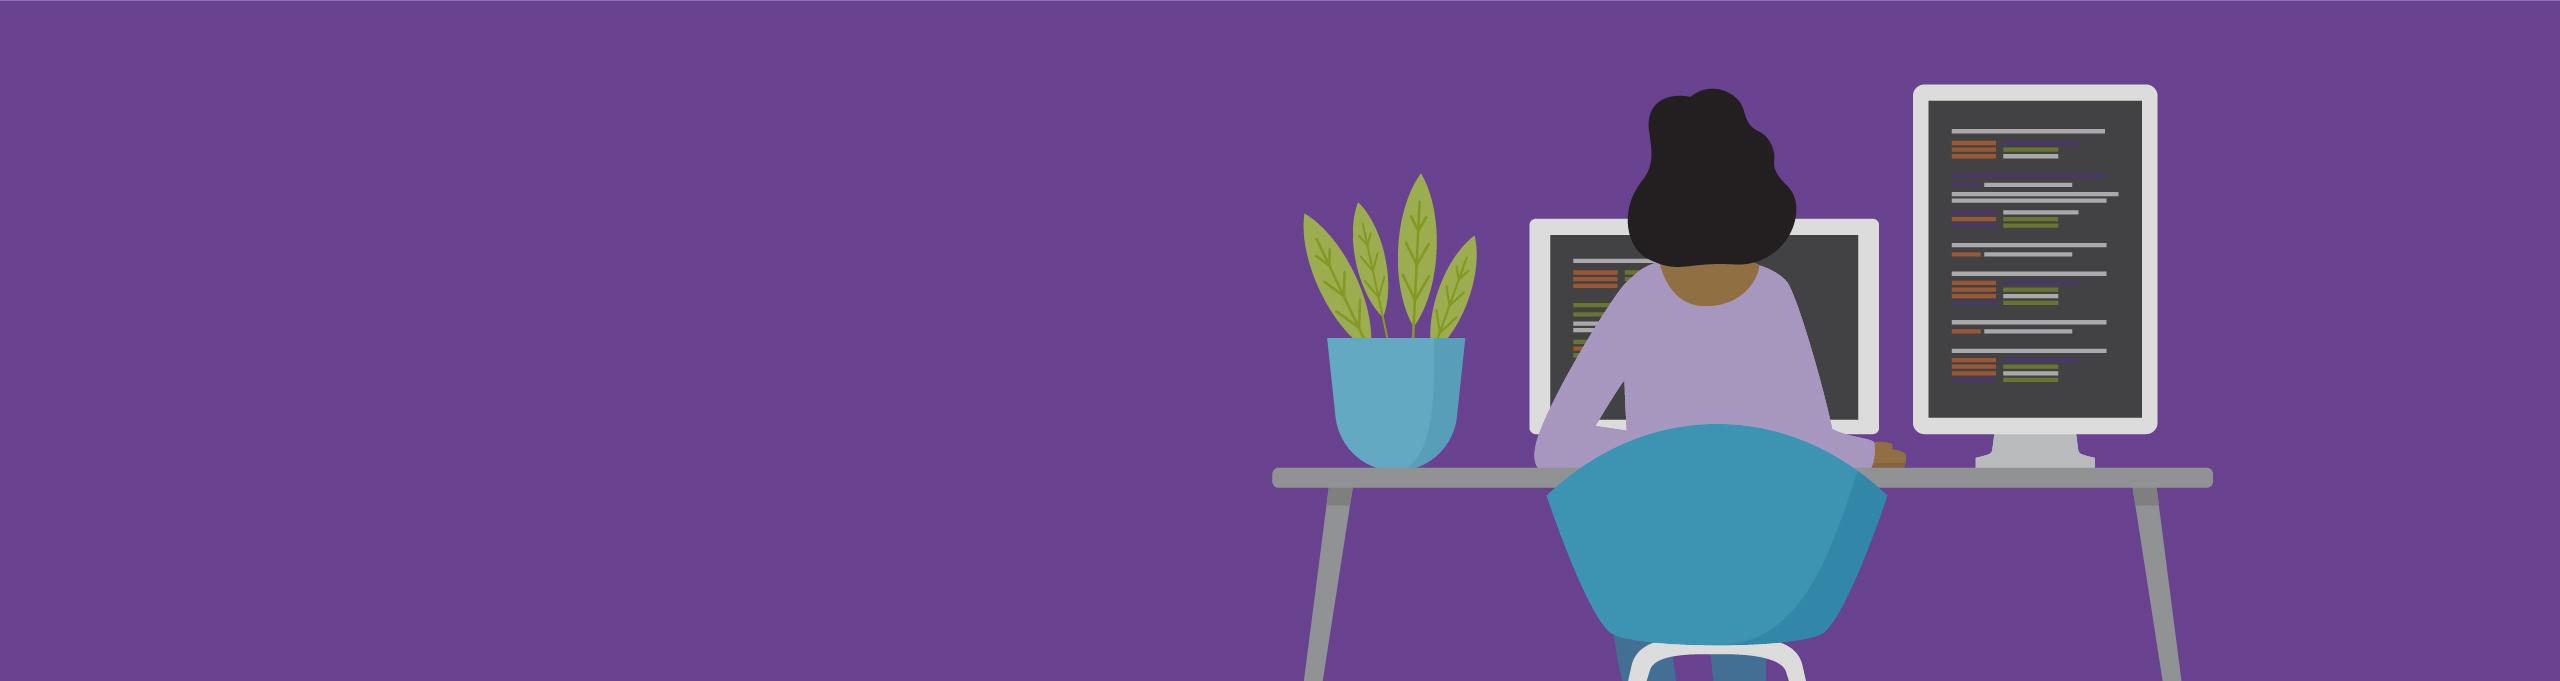 Developer Portal Purple Hero